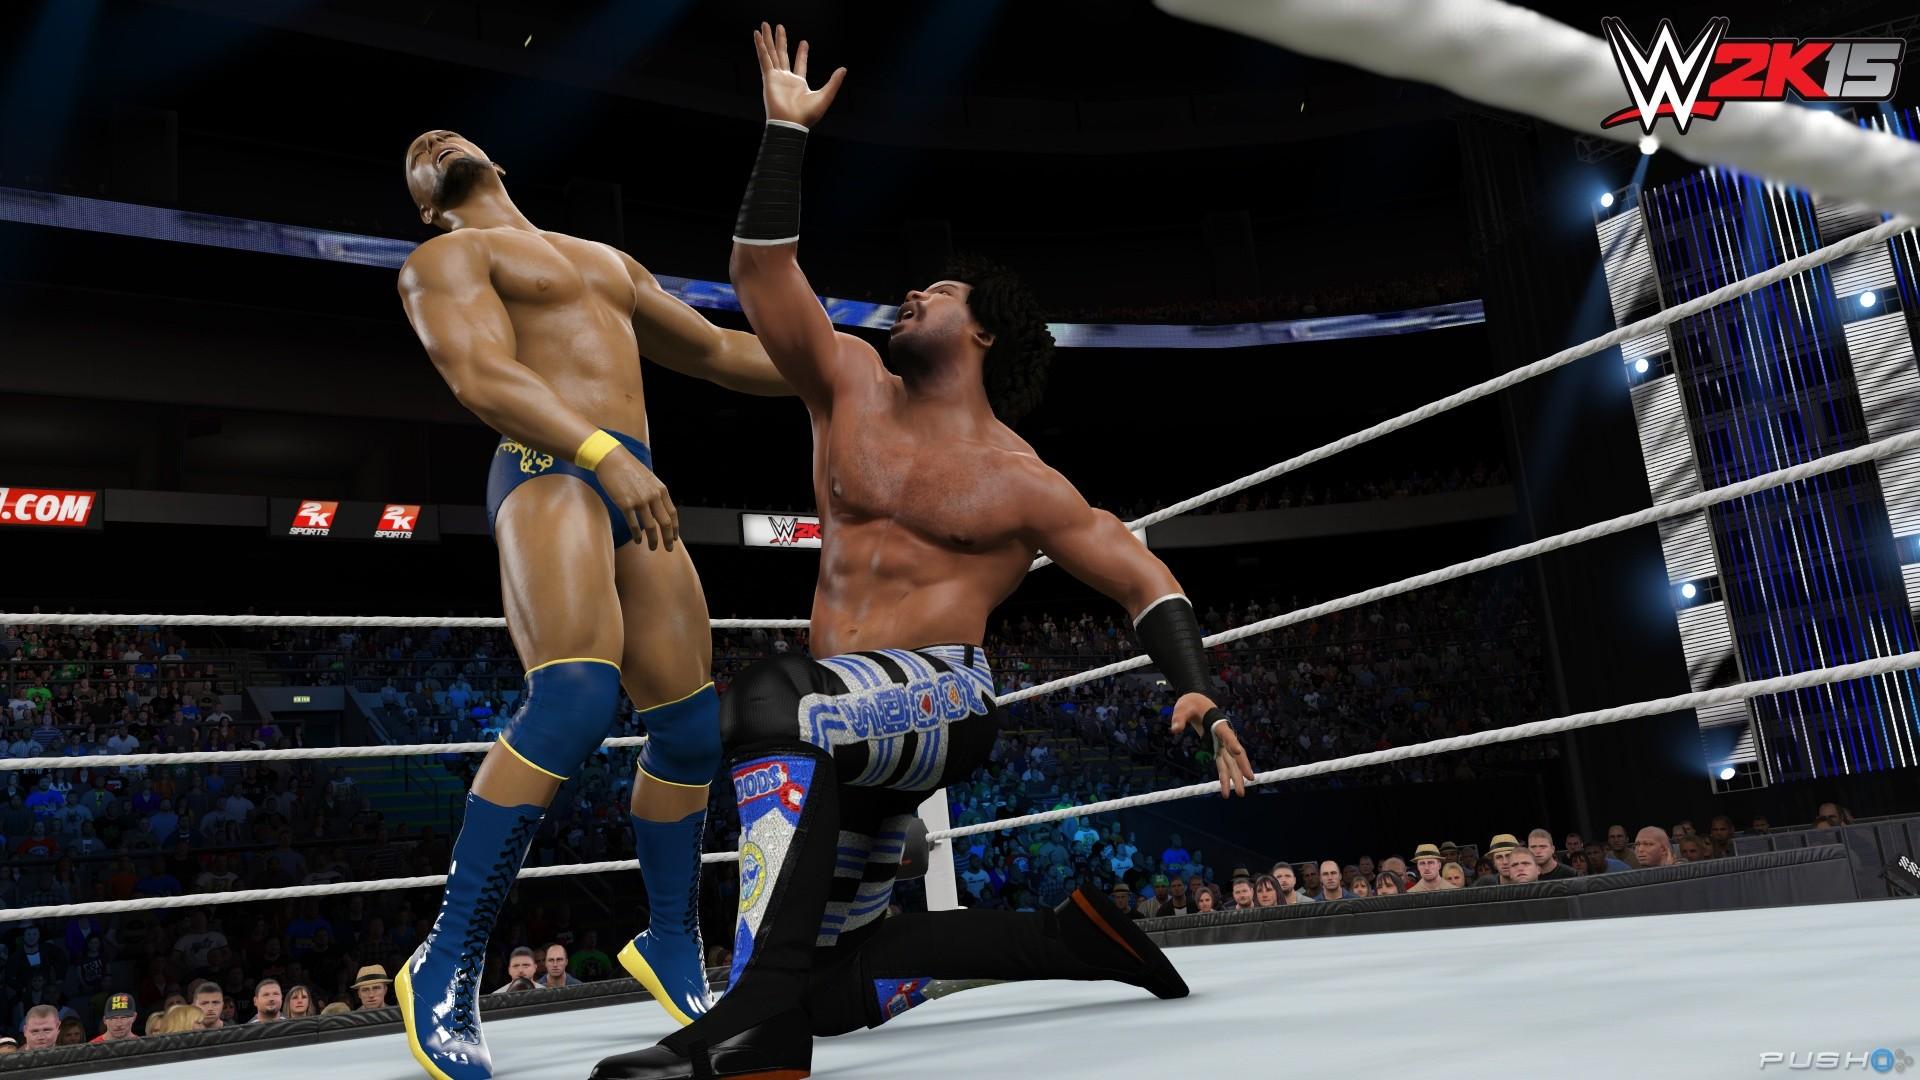 Res: 1920x1080, WWE 2K15 Review - Screenshot 2 of 7